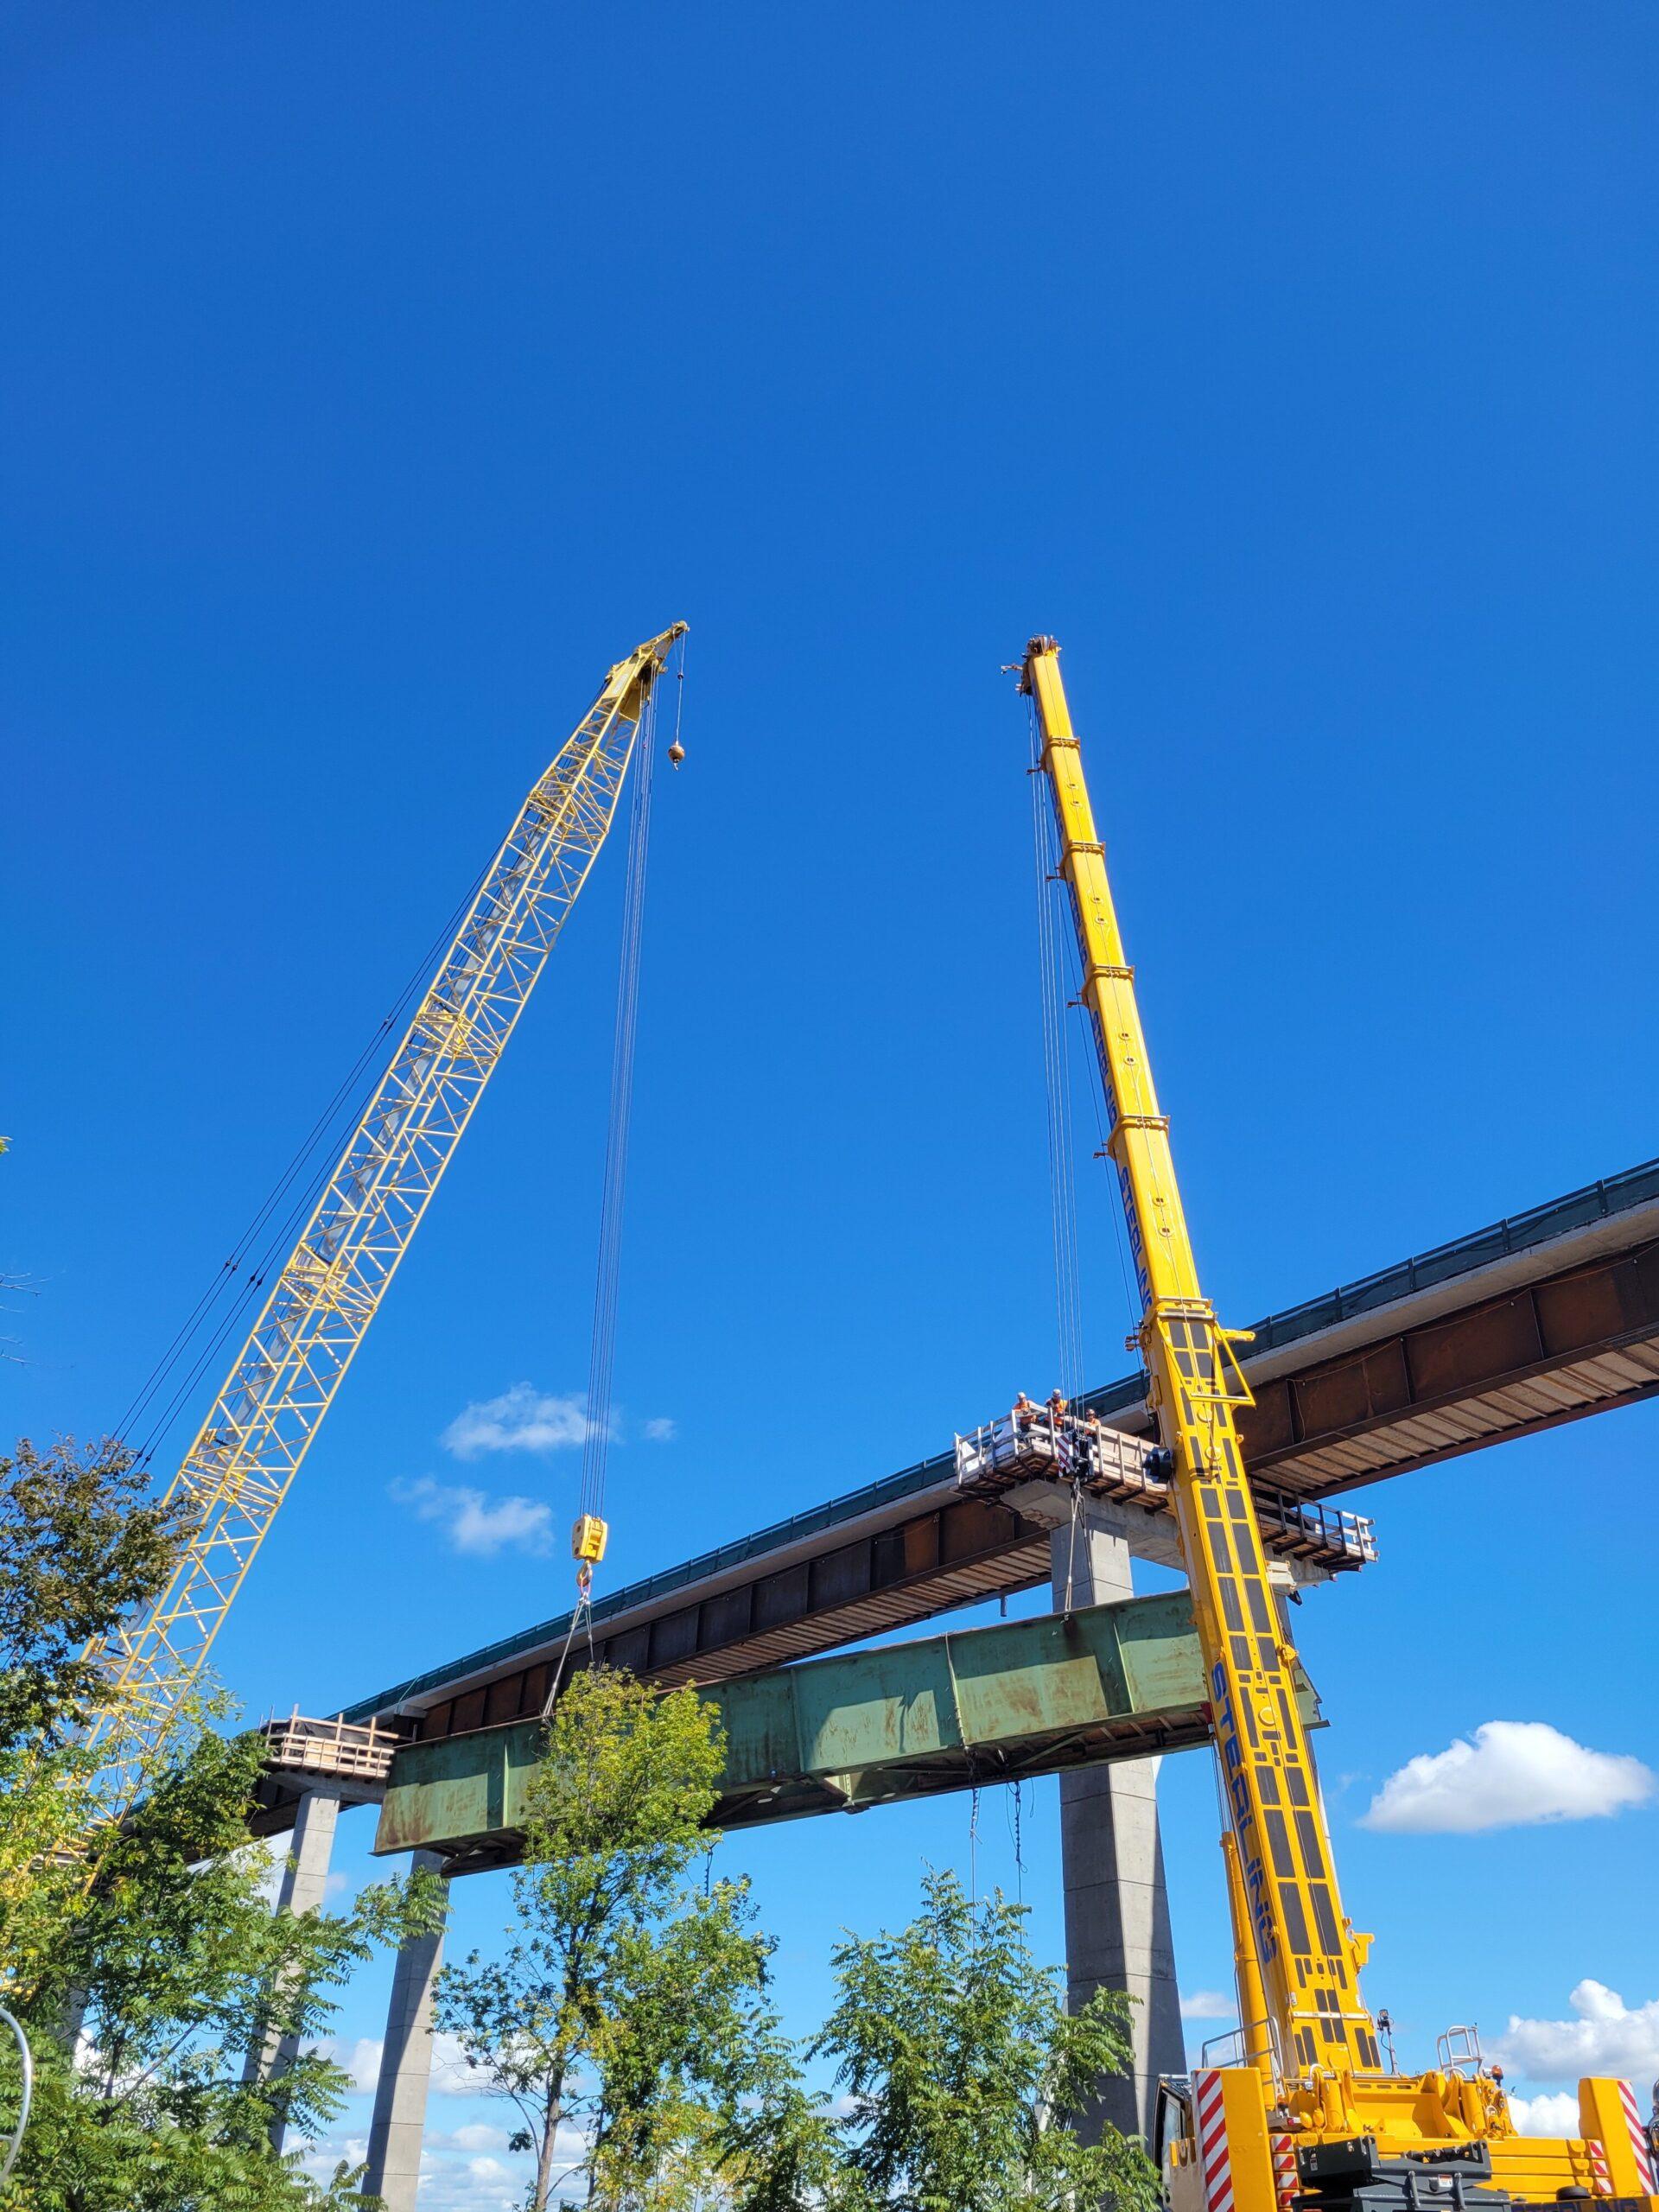 200 and 300-ton crane lowering the hammerhead girder